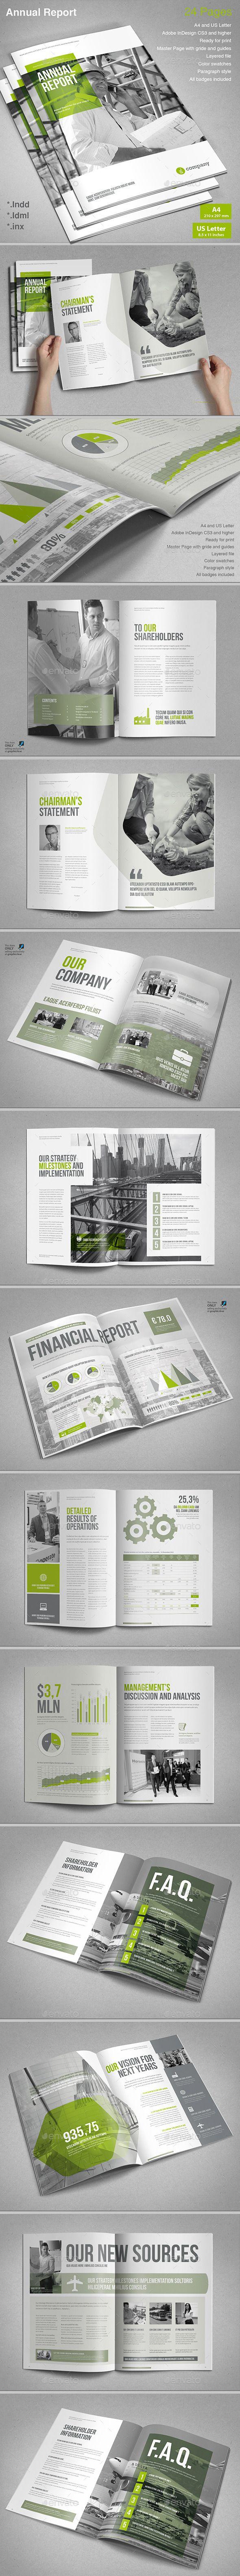 Annual Report Template #design Download: http://graphicriver.net/item/annual-report/13169034?ref=ksioks